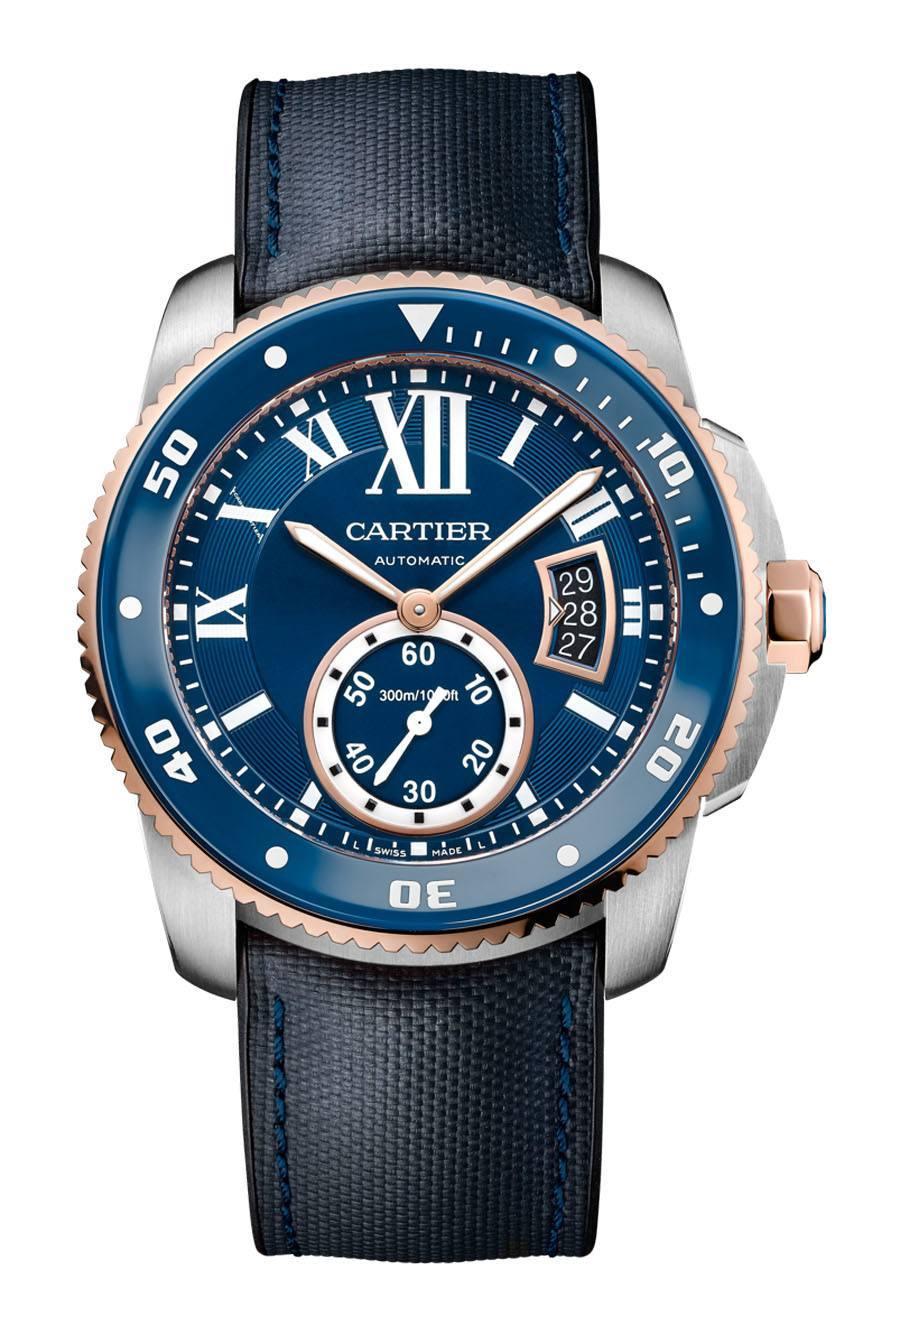 Cartier: Calibre de Cartier Diver Blue in Rotgold und Edelstahl